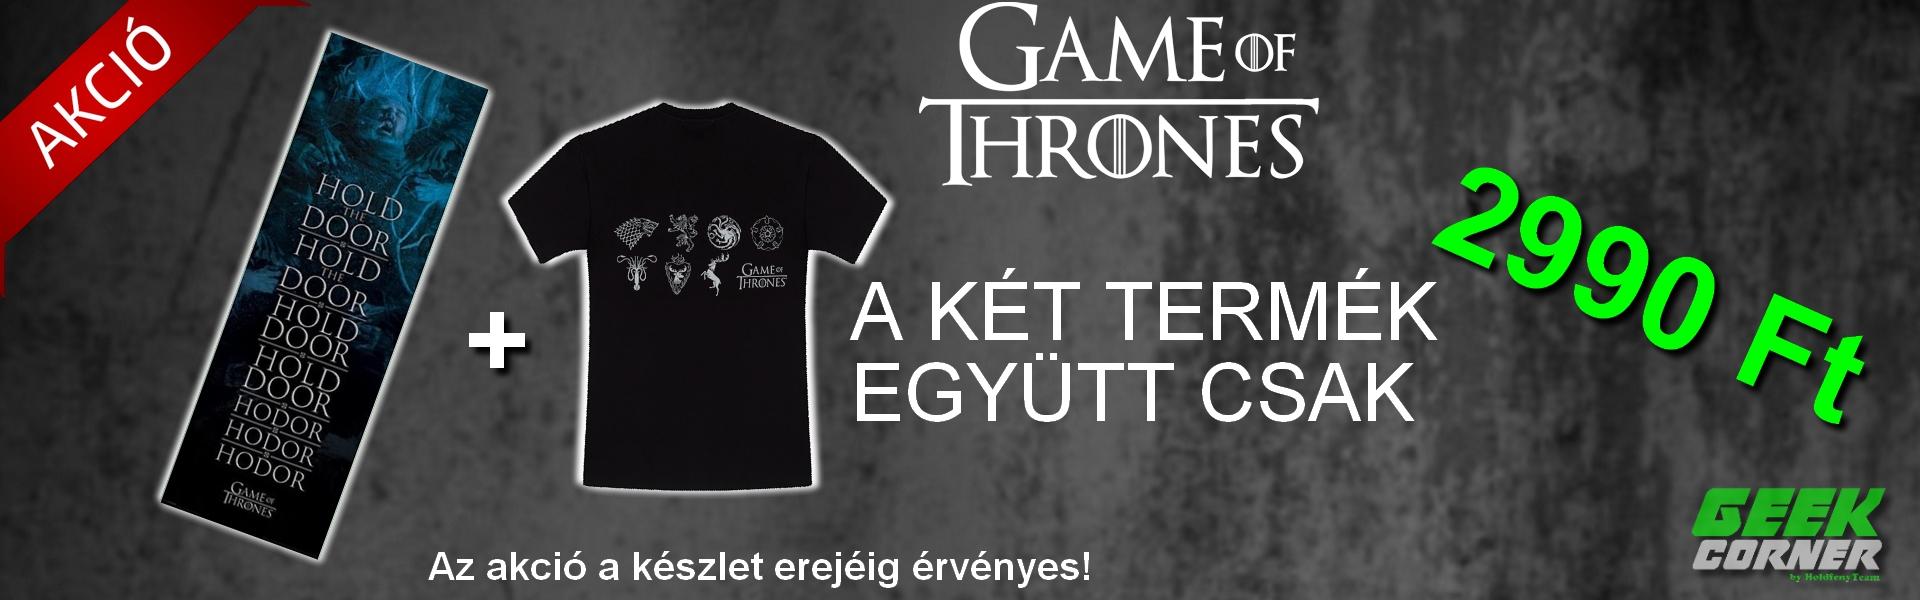 Game of Thrones akciós ajánlat